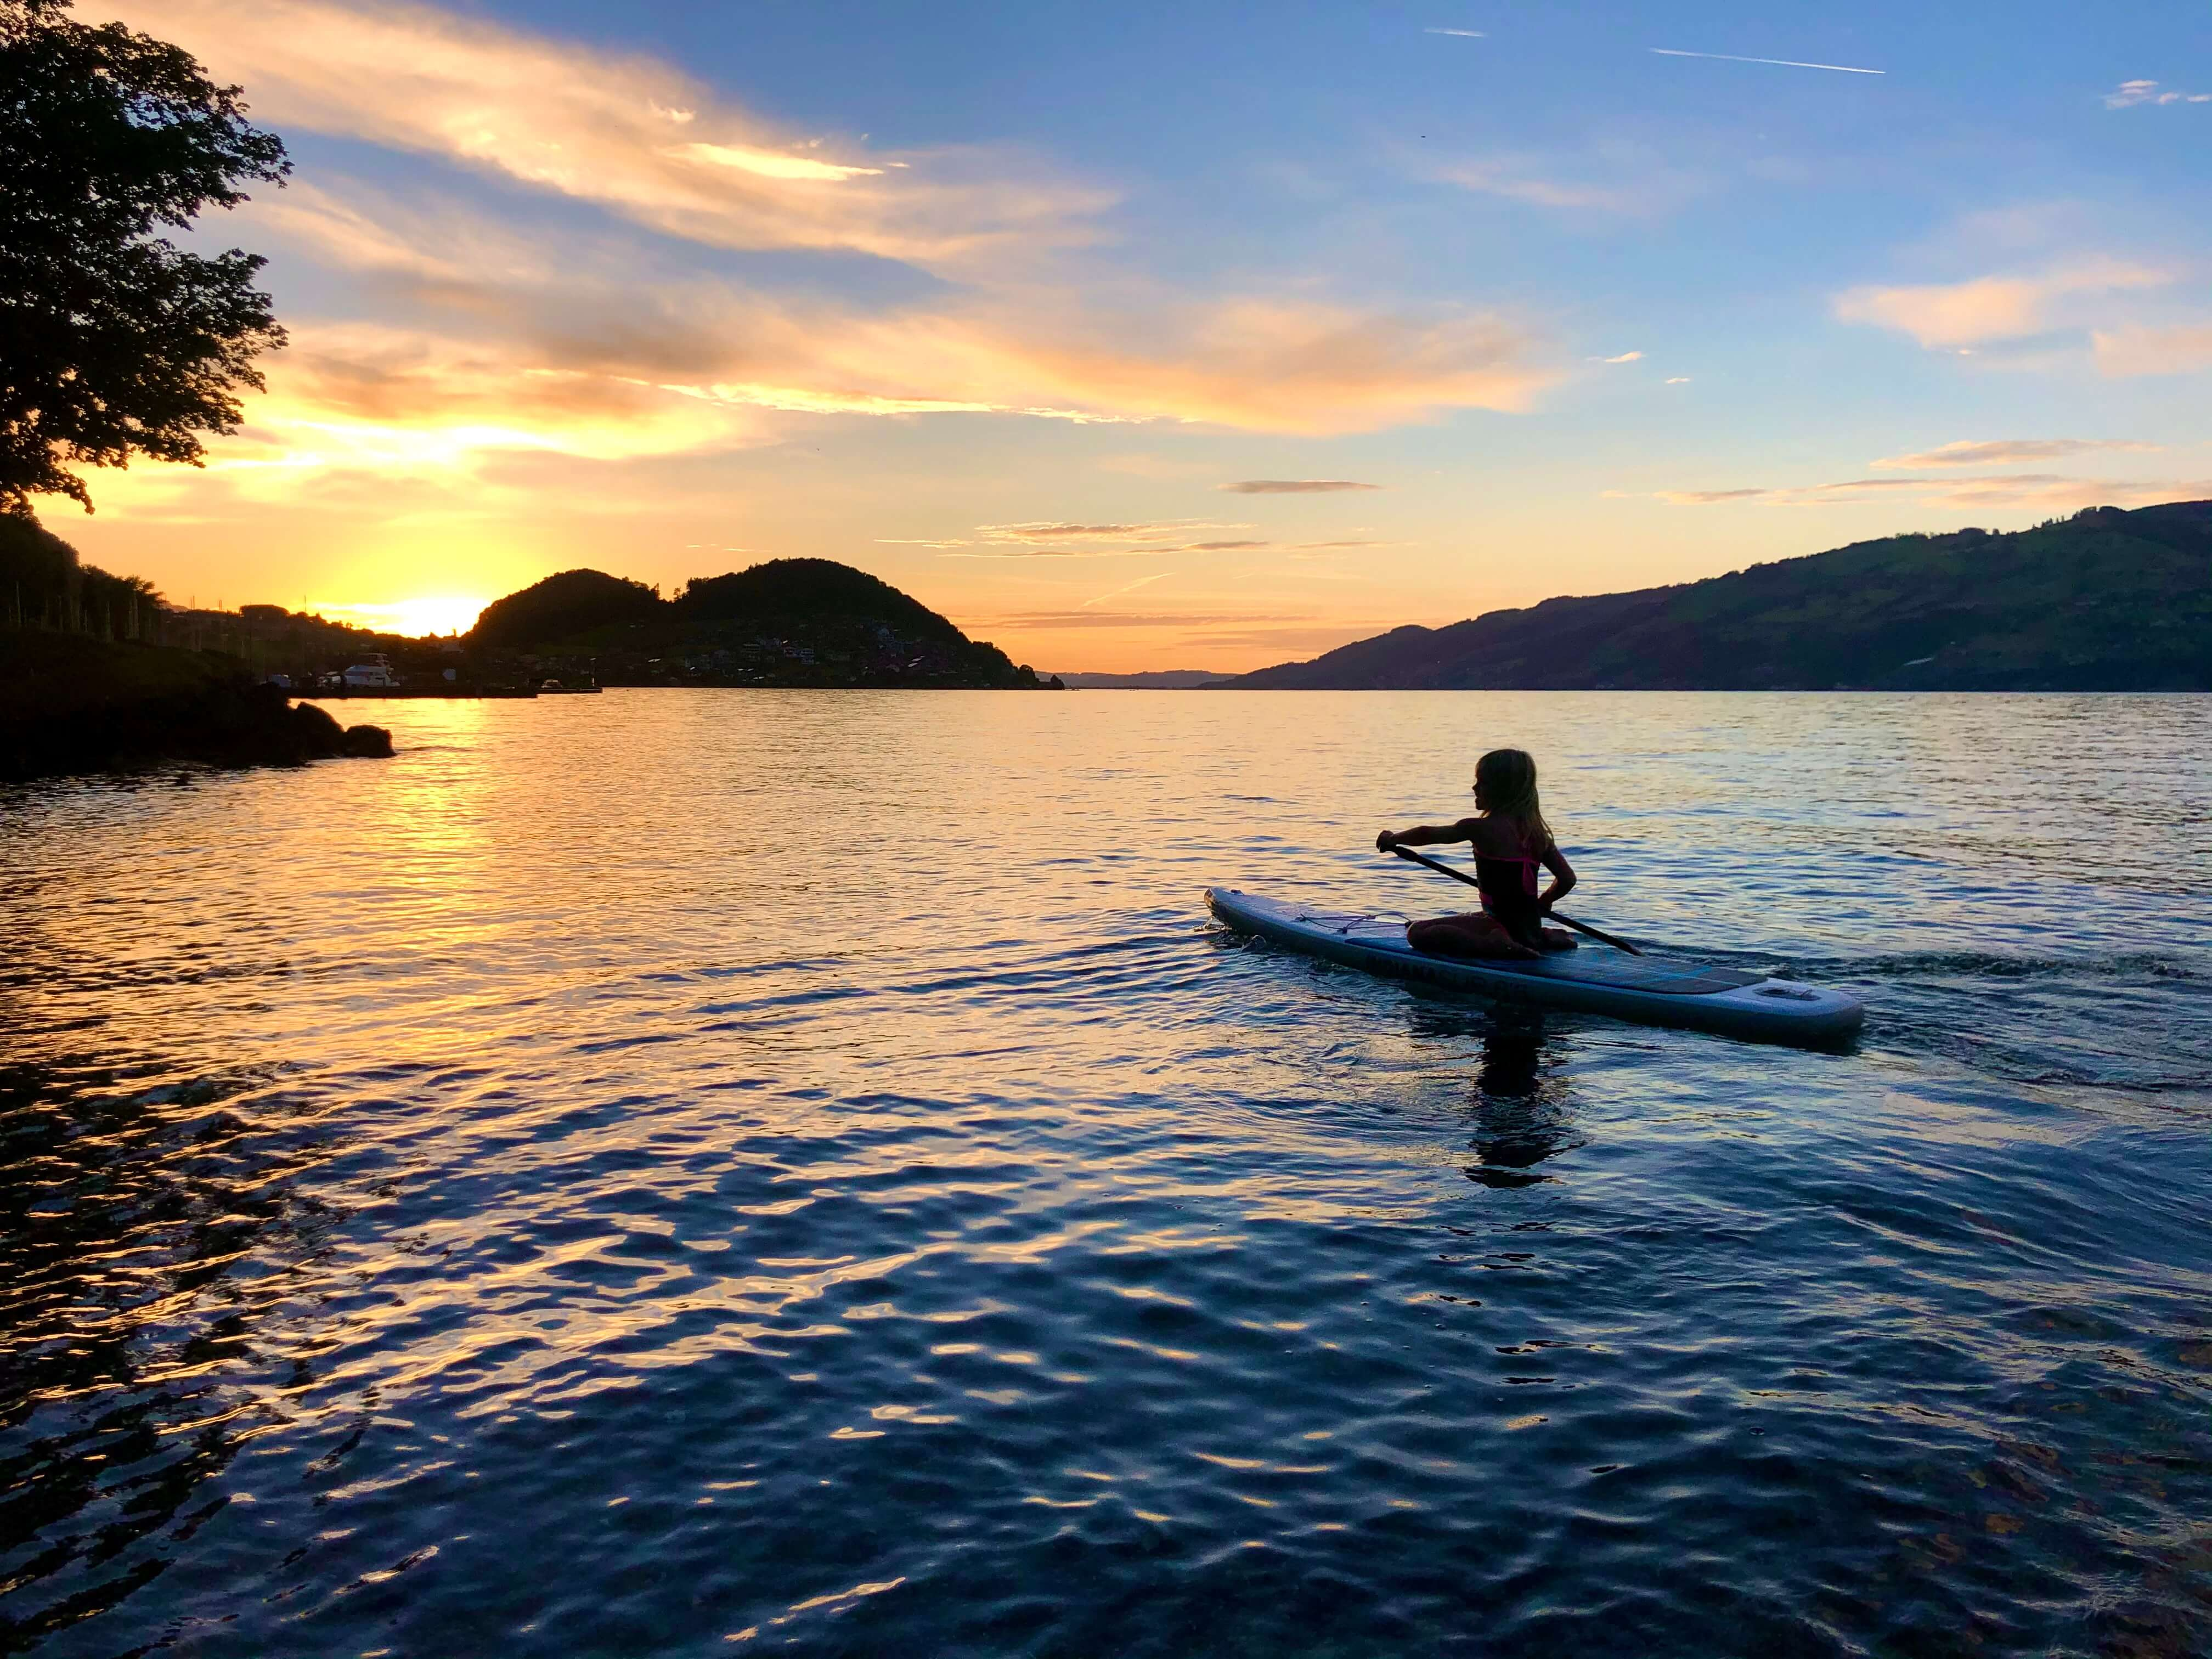 bistro-blue-turtle-sunset-sup-faulensee-sommer.jpg